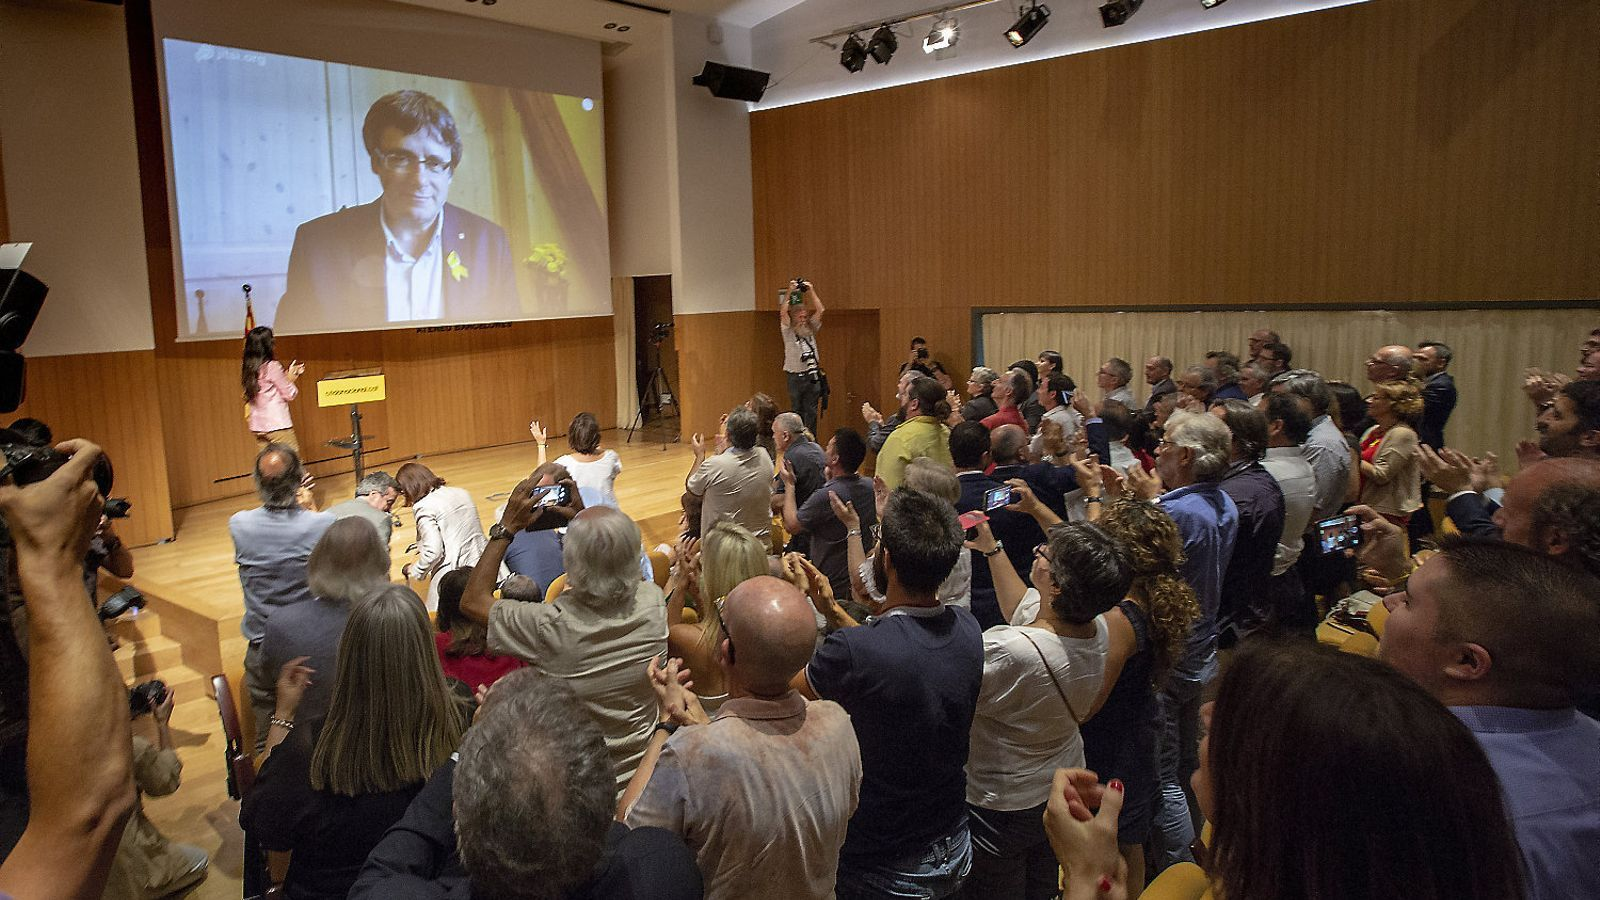 https://www.ara.cat/2018/07/17/politica/Carles-Puigdemont-Crida-Ateneu-Barcelones_2053004742_55398969_540x343.jpg